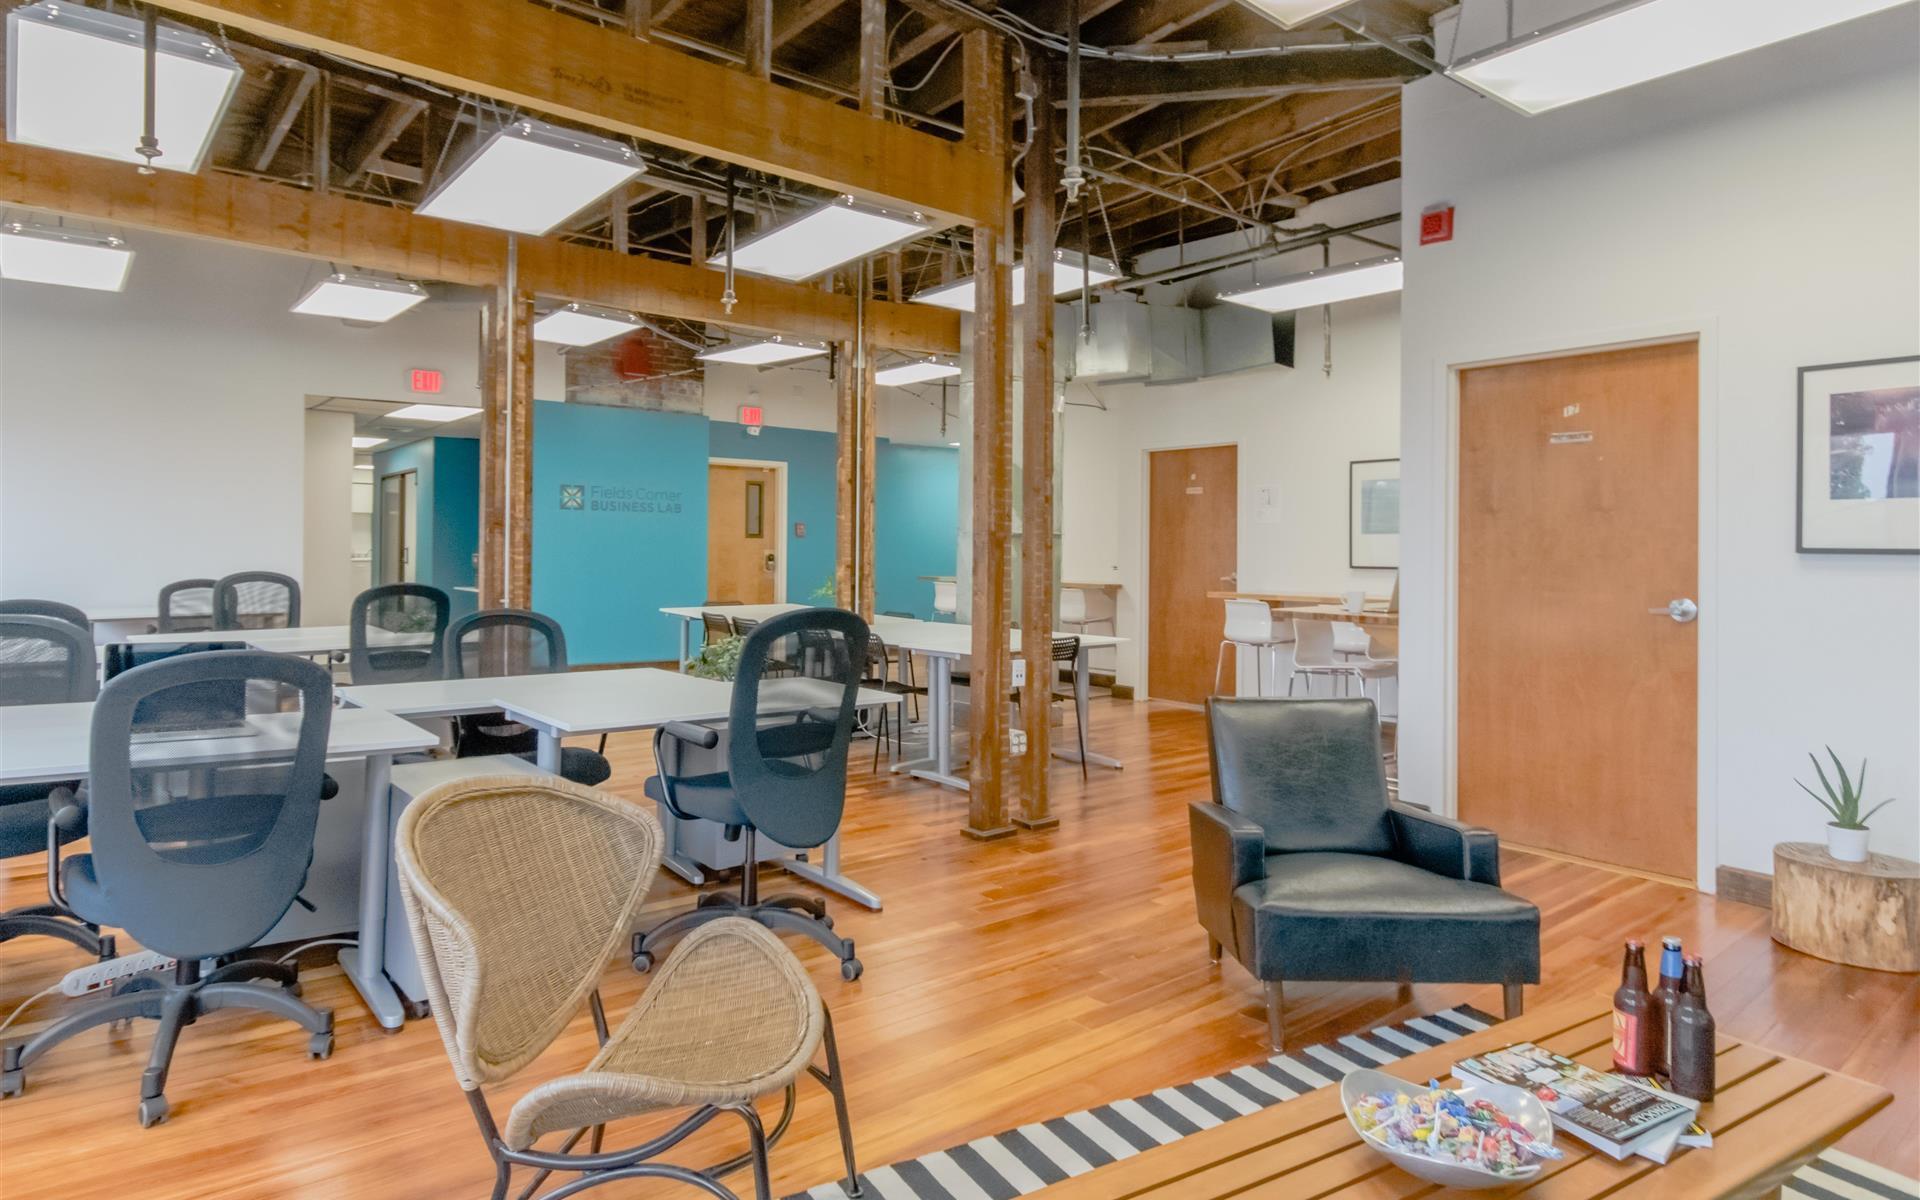 Fields Corner Business Lab - Part Time Membership